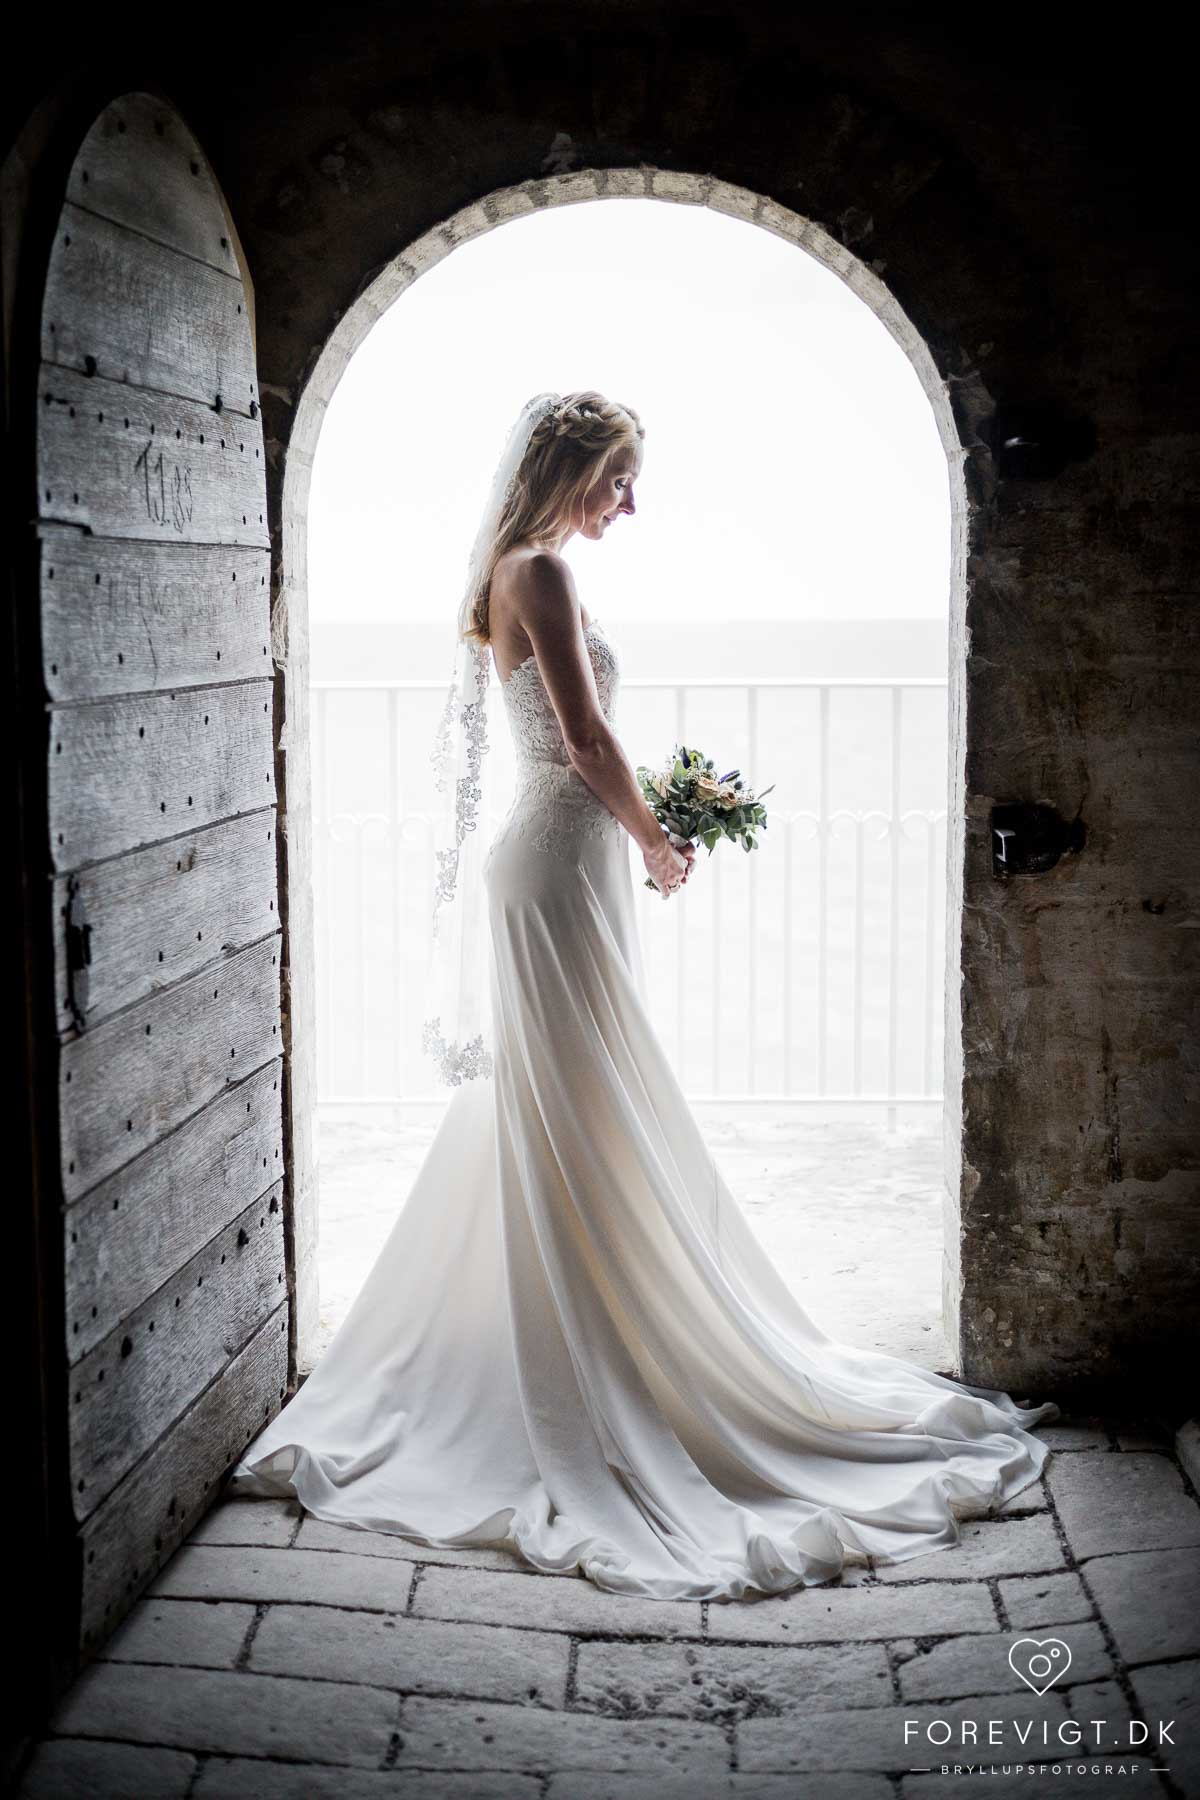 Unik bryllupsfotografi - Sjælland